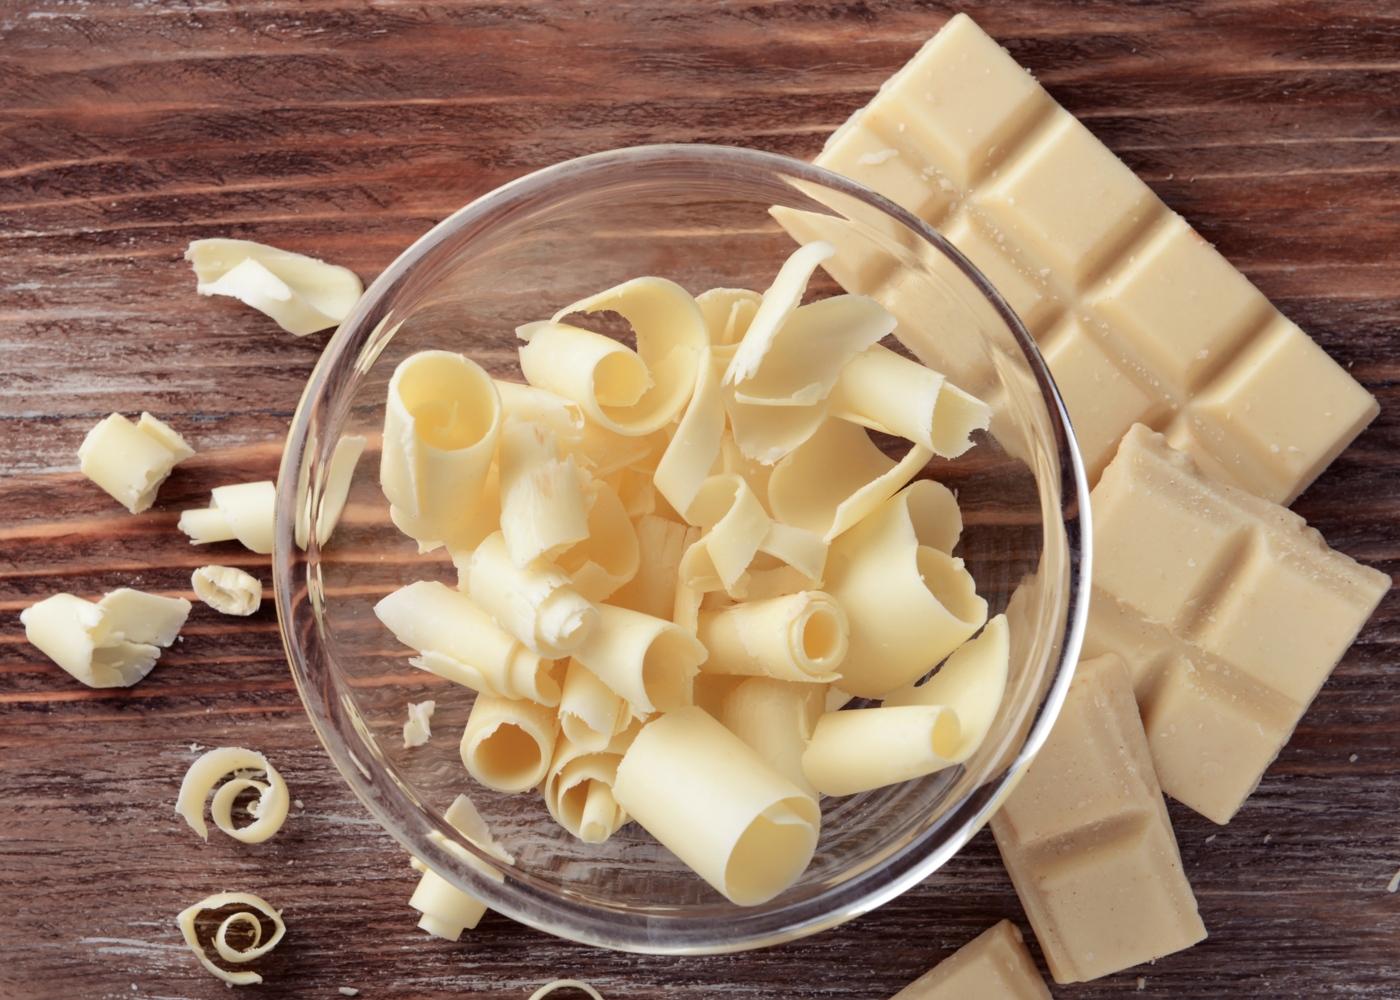 Ganache de chocolate branco